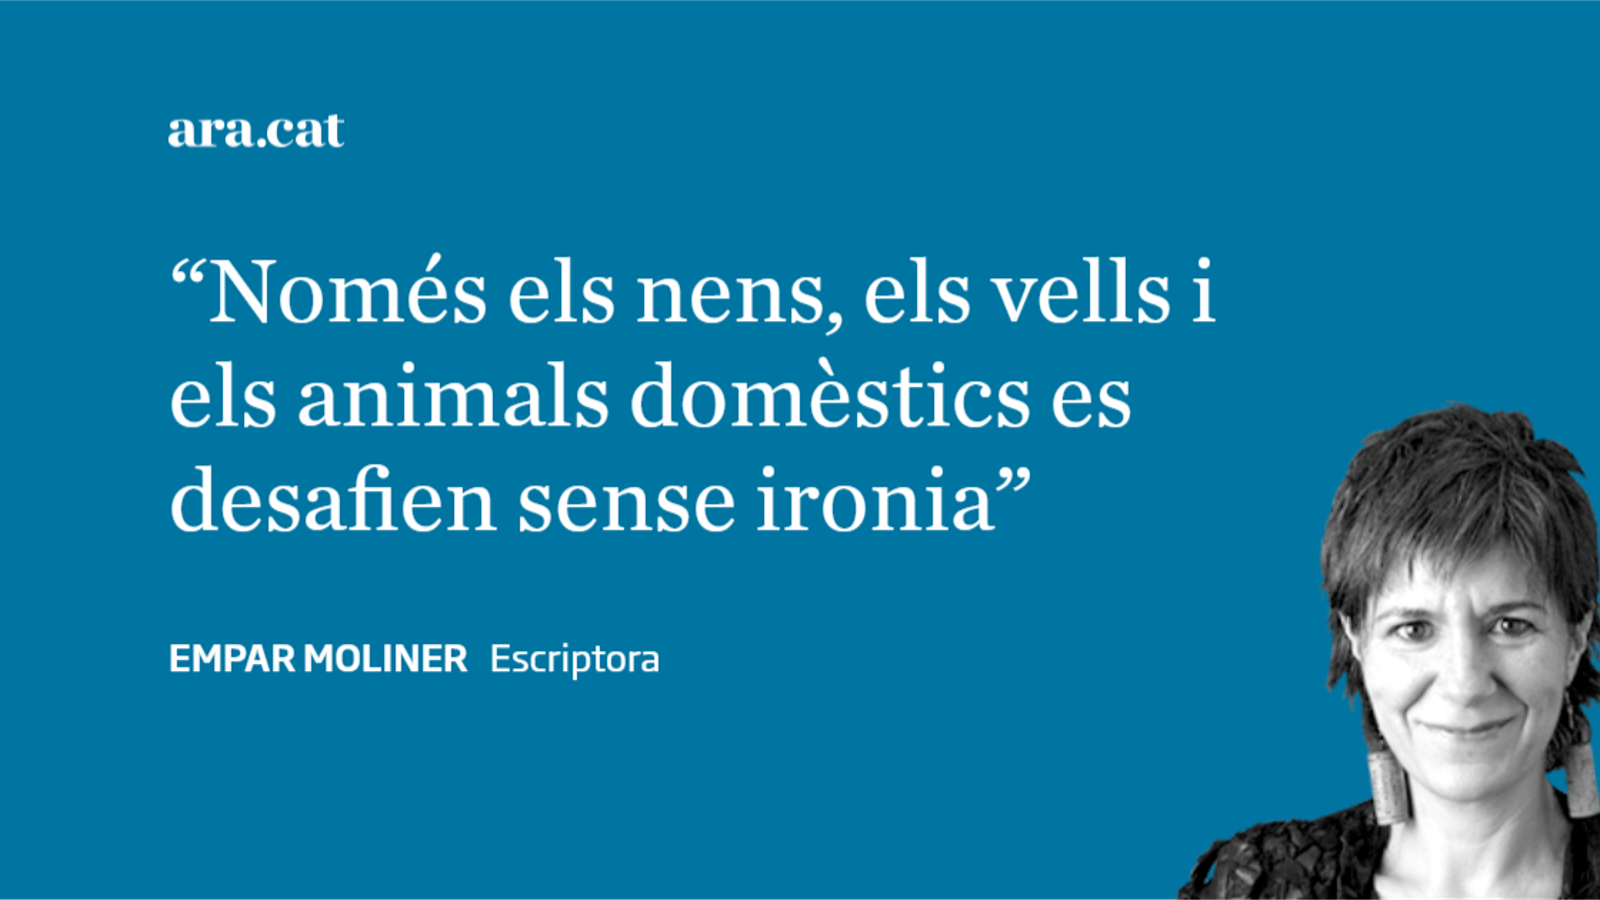 Josep Bou (i Vila...)